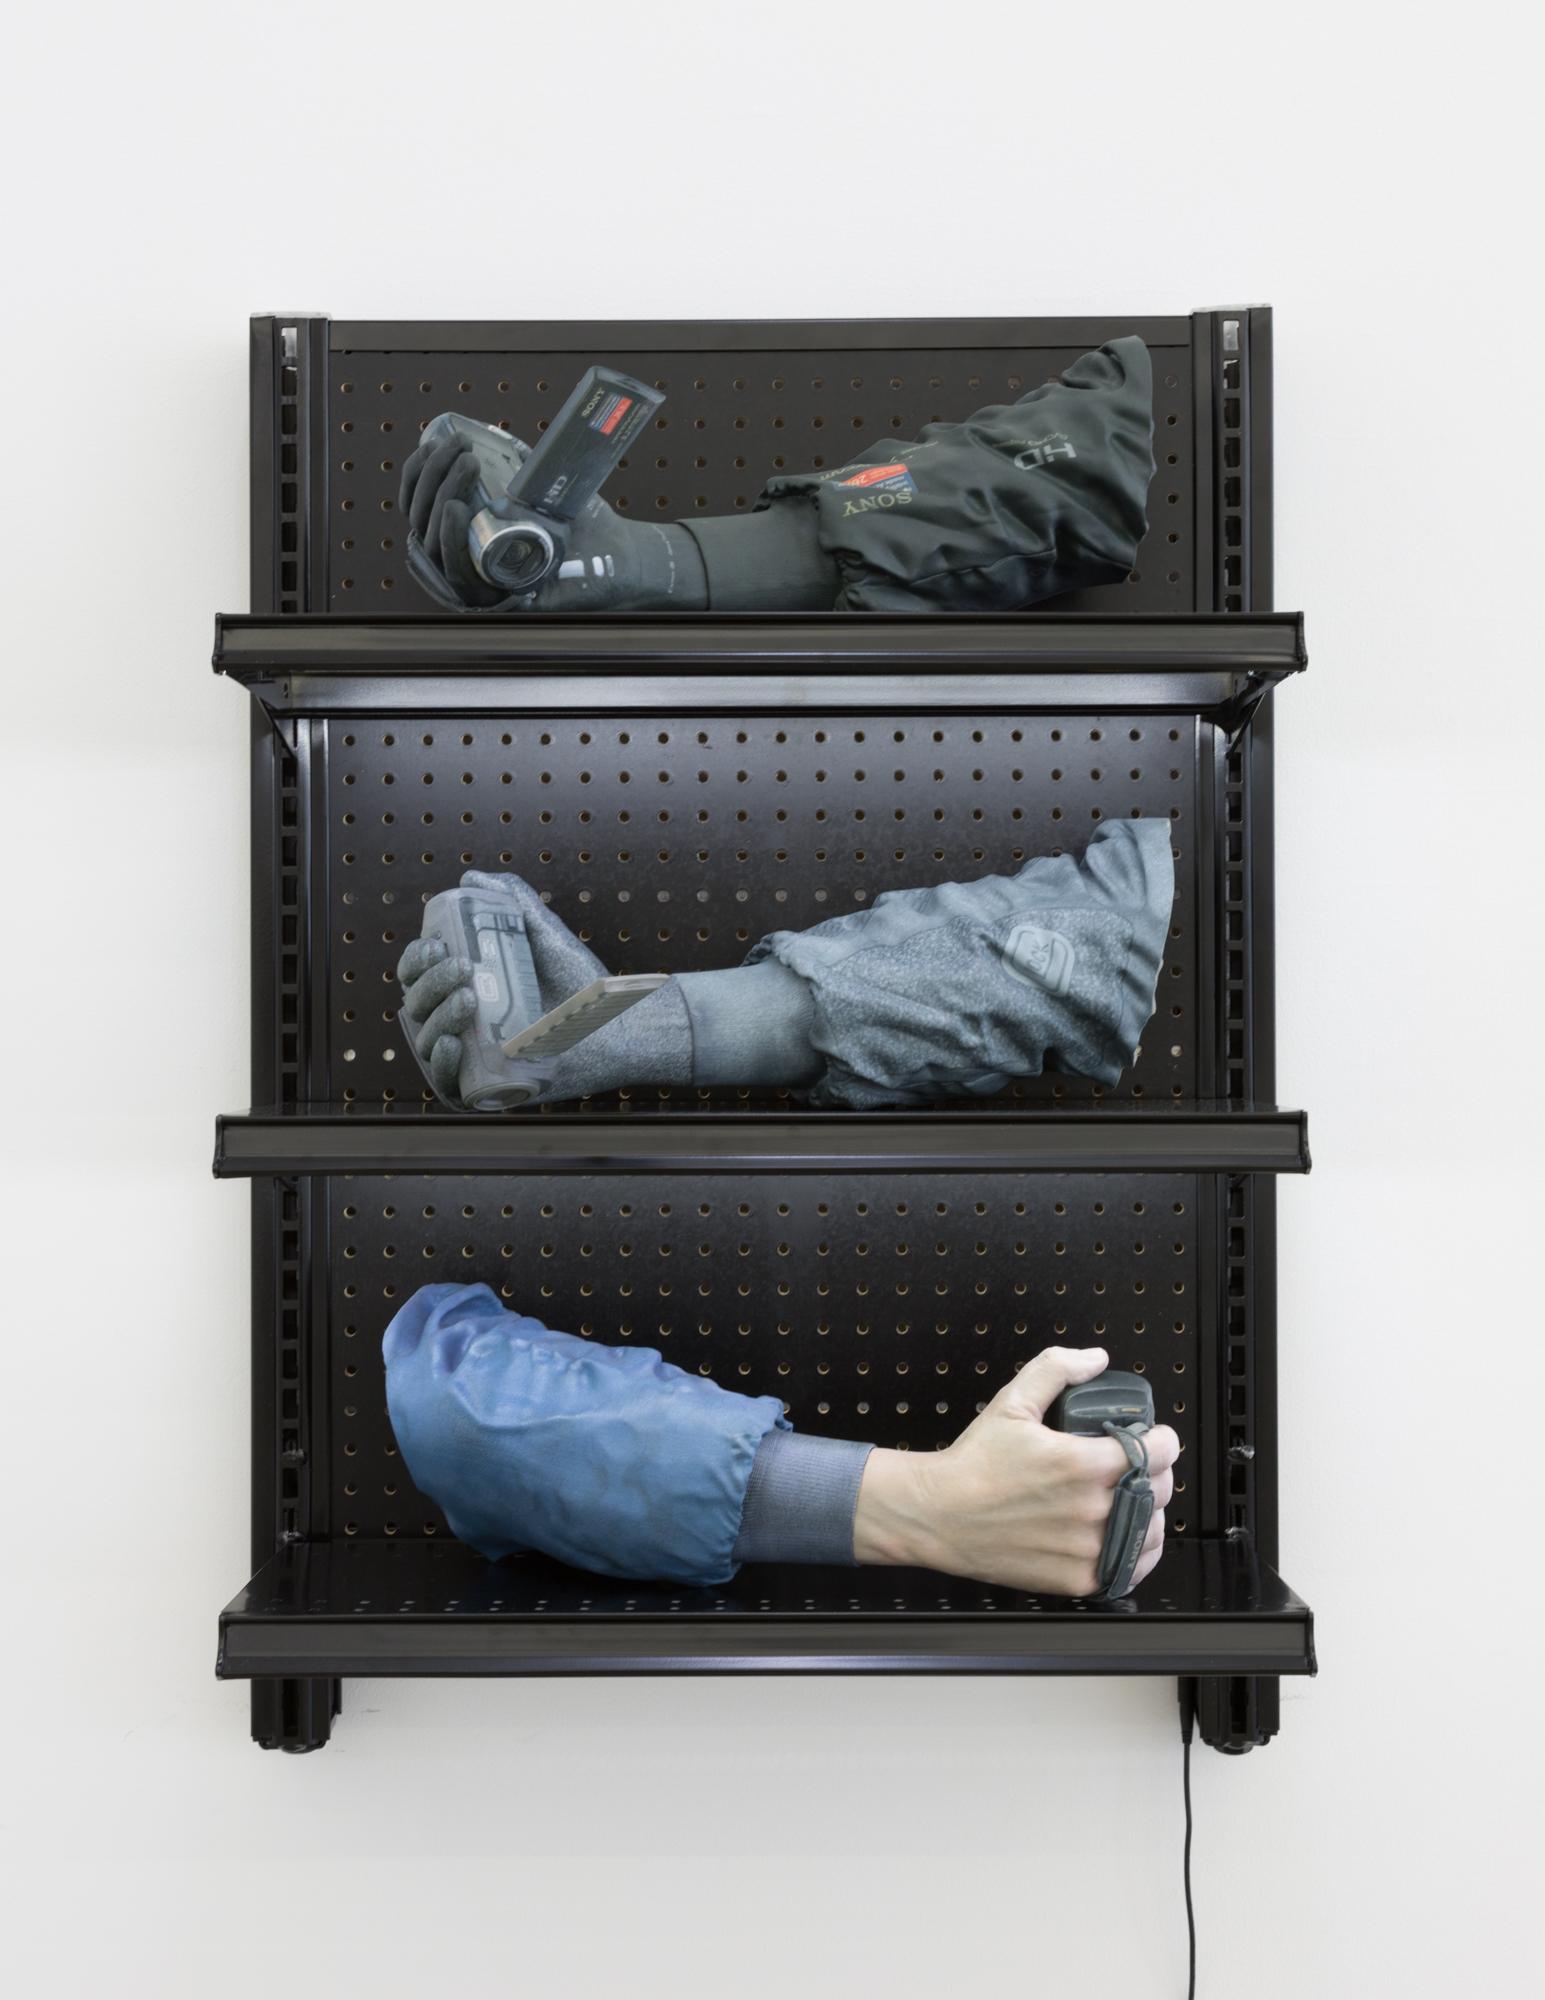 Josh Kline,  Facial Incarceration Software , 2015-16, installation view